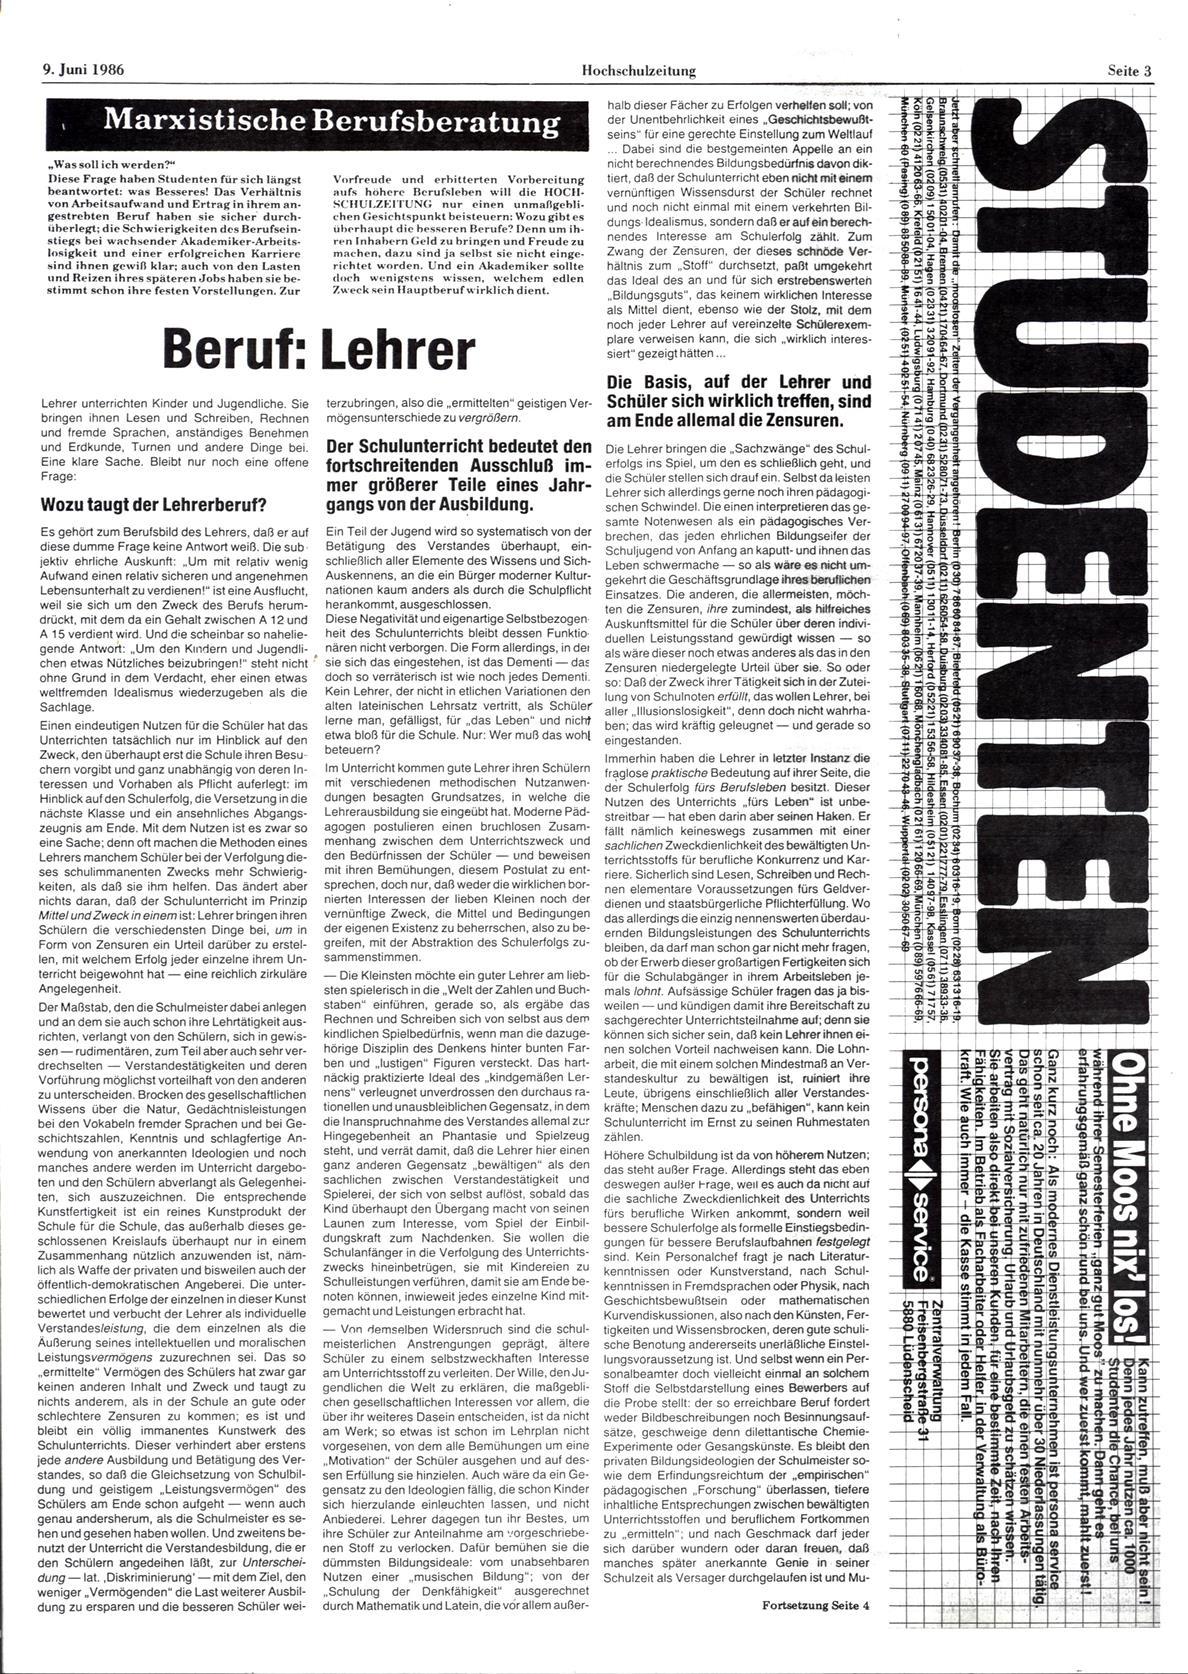 Bochum_BHZ_19860609_131_003